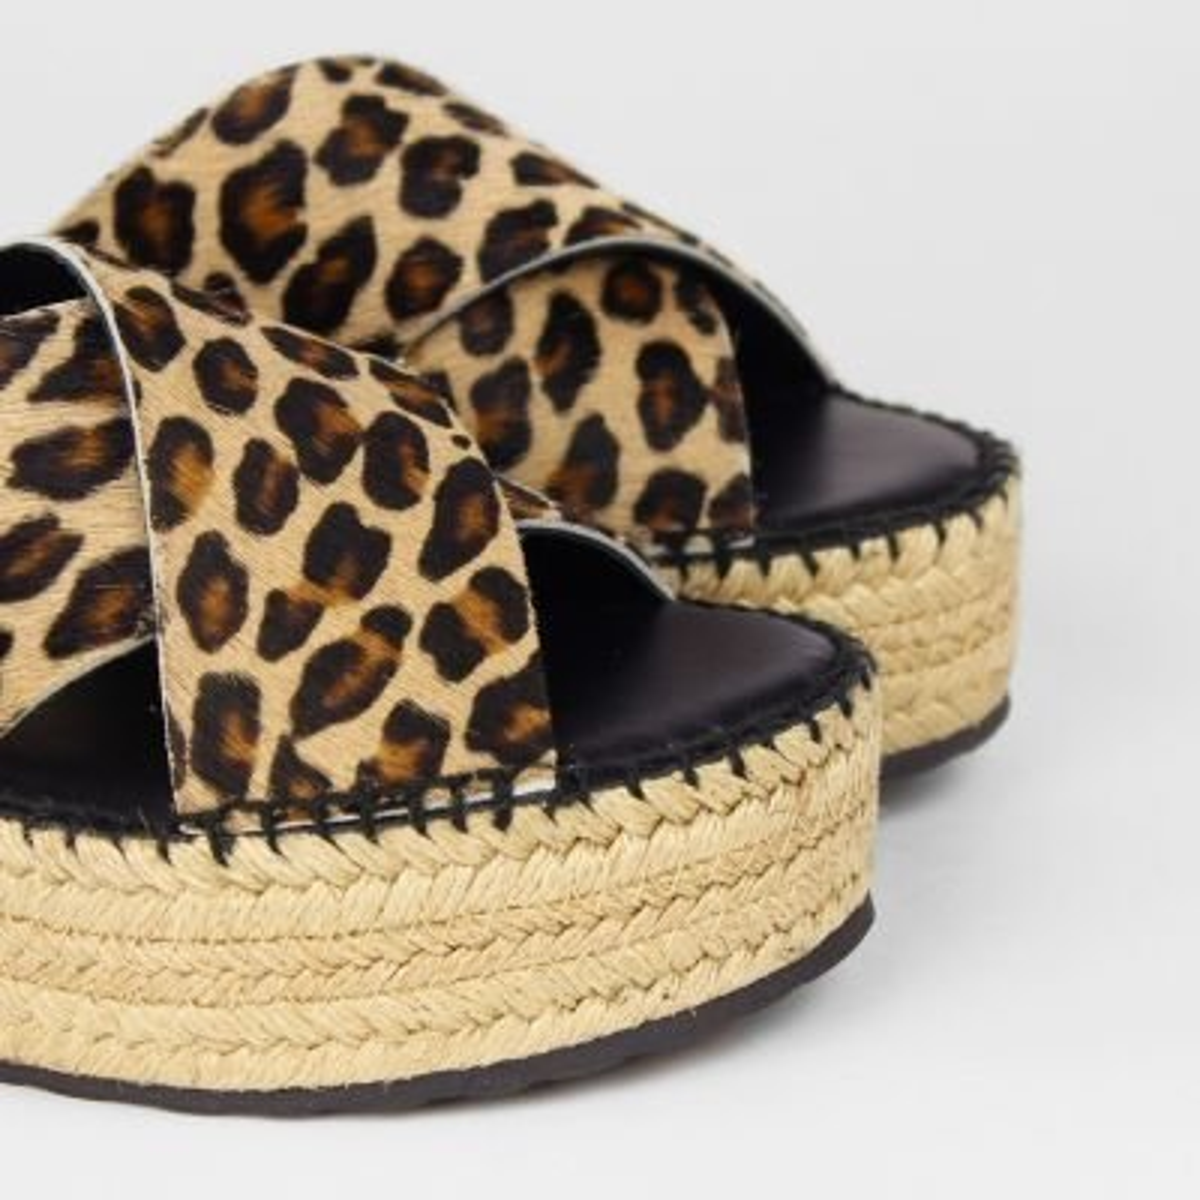 Espadrille-slipper-Yara-Michels-pony-leopard